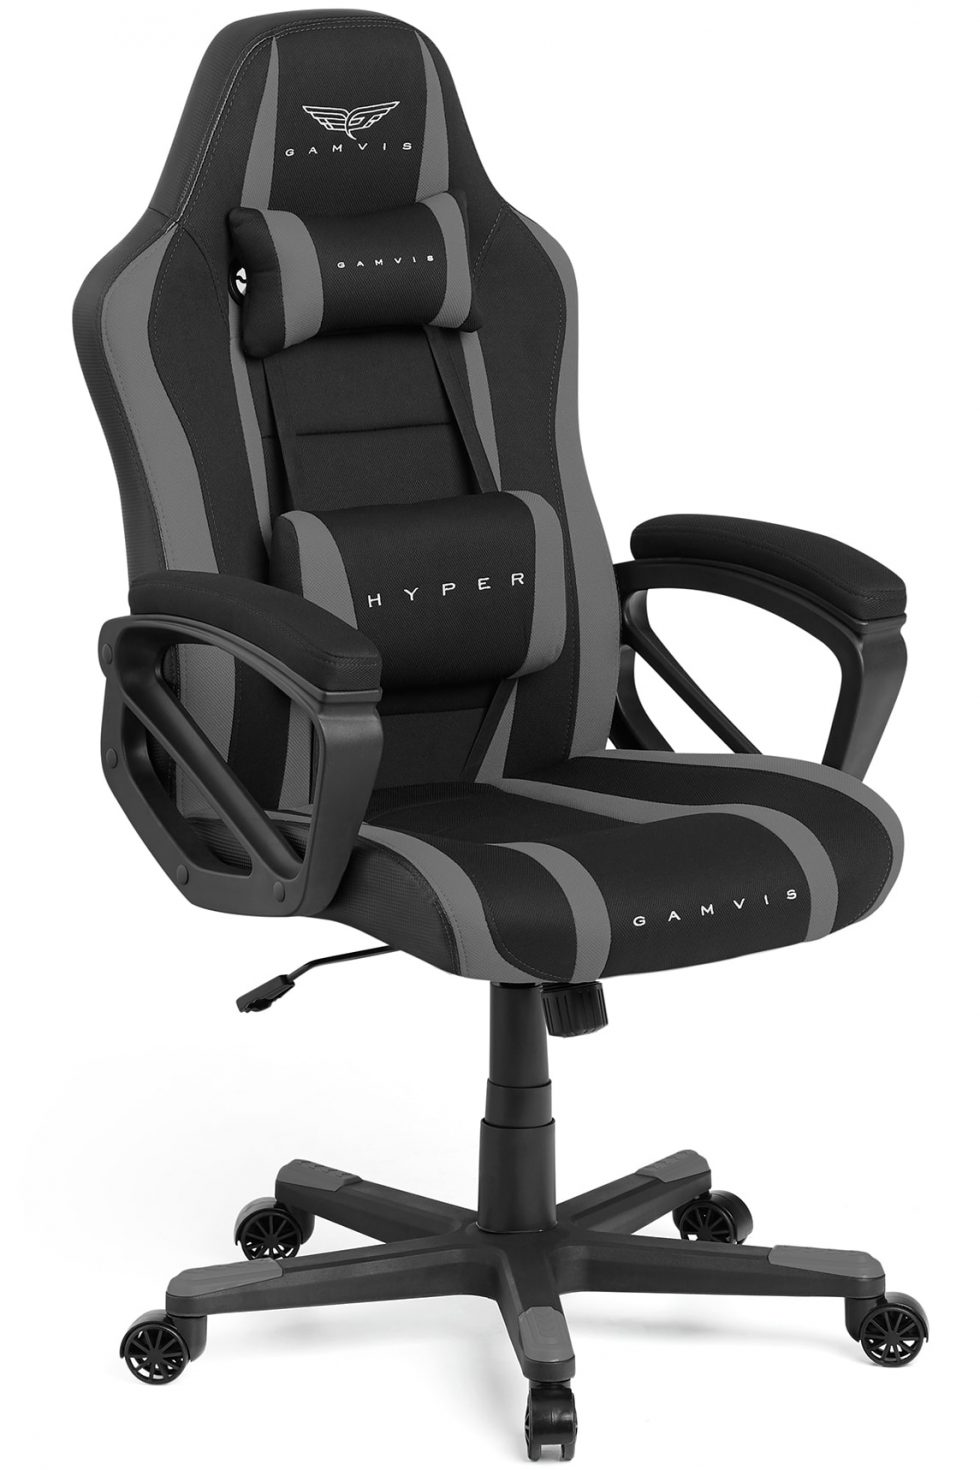 Gamvis Hyper Gaming Chair Fabric Black Gray